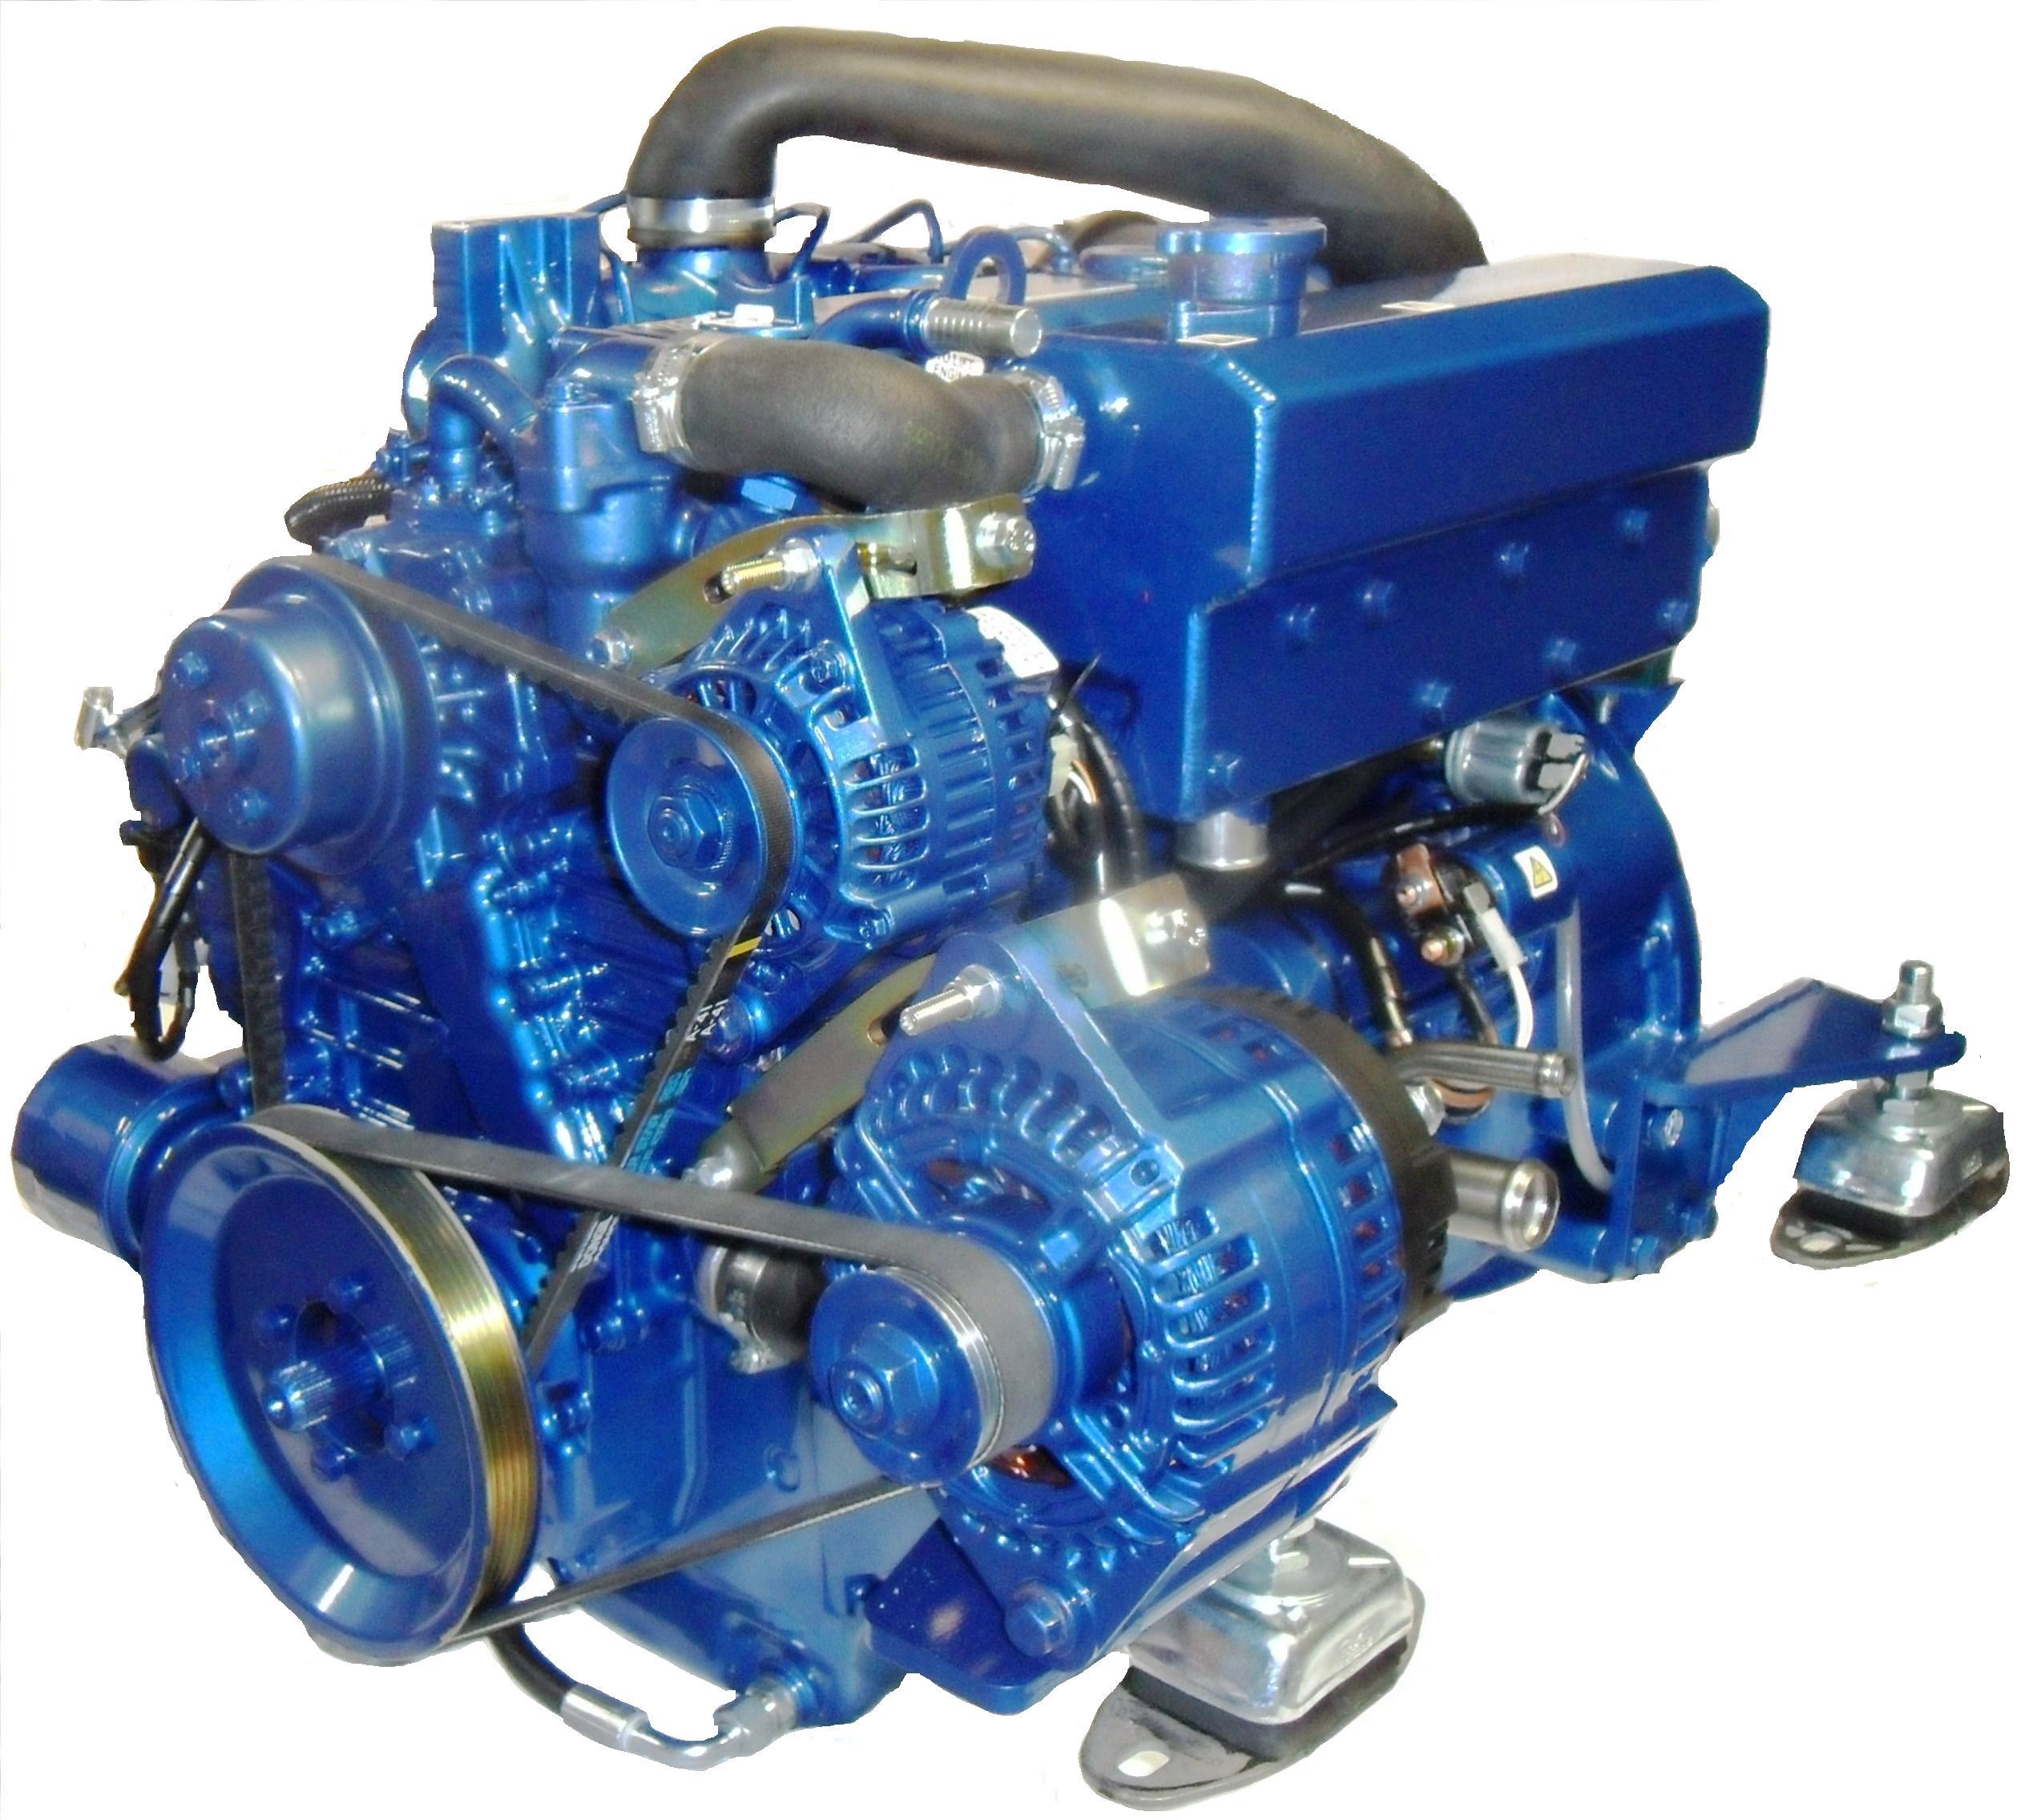 Canaline 52 Marine Engine Canaline Engines